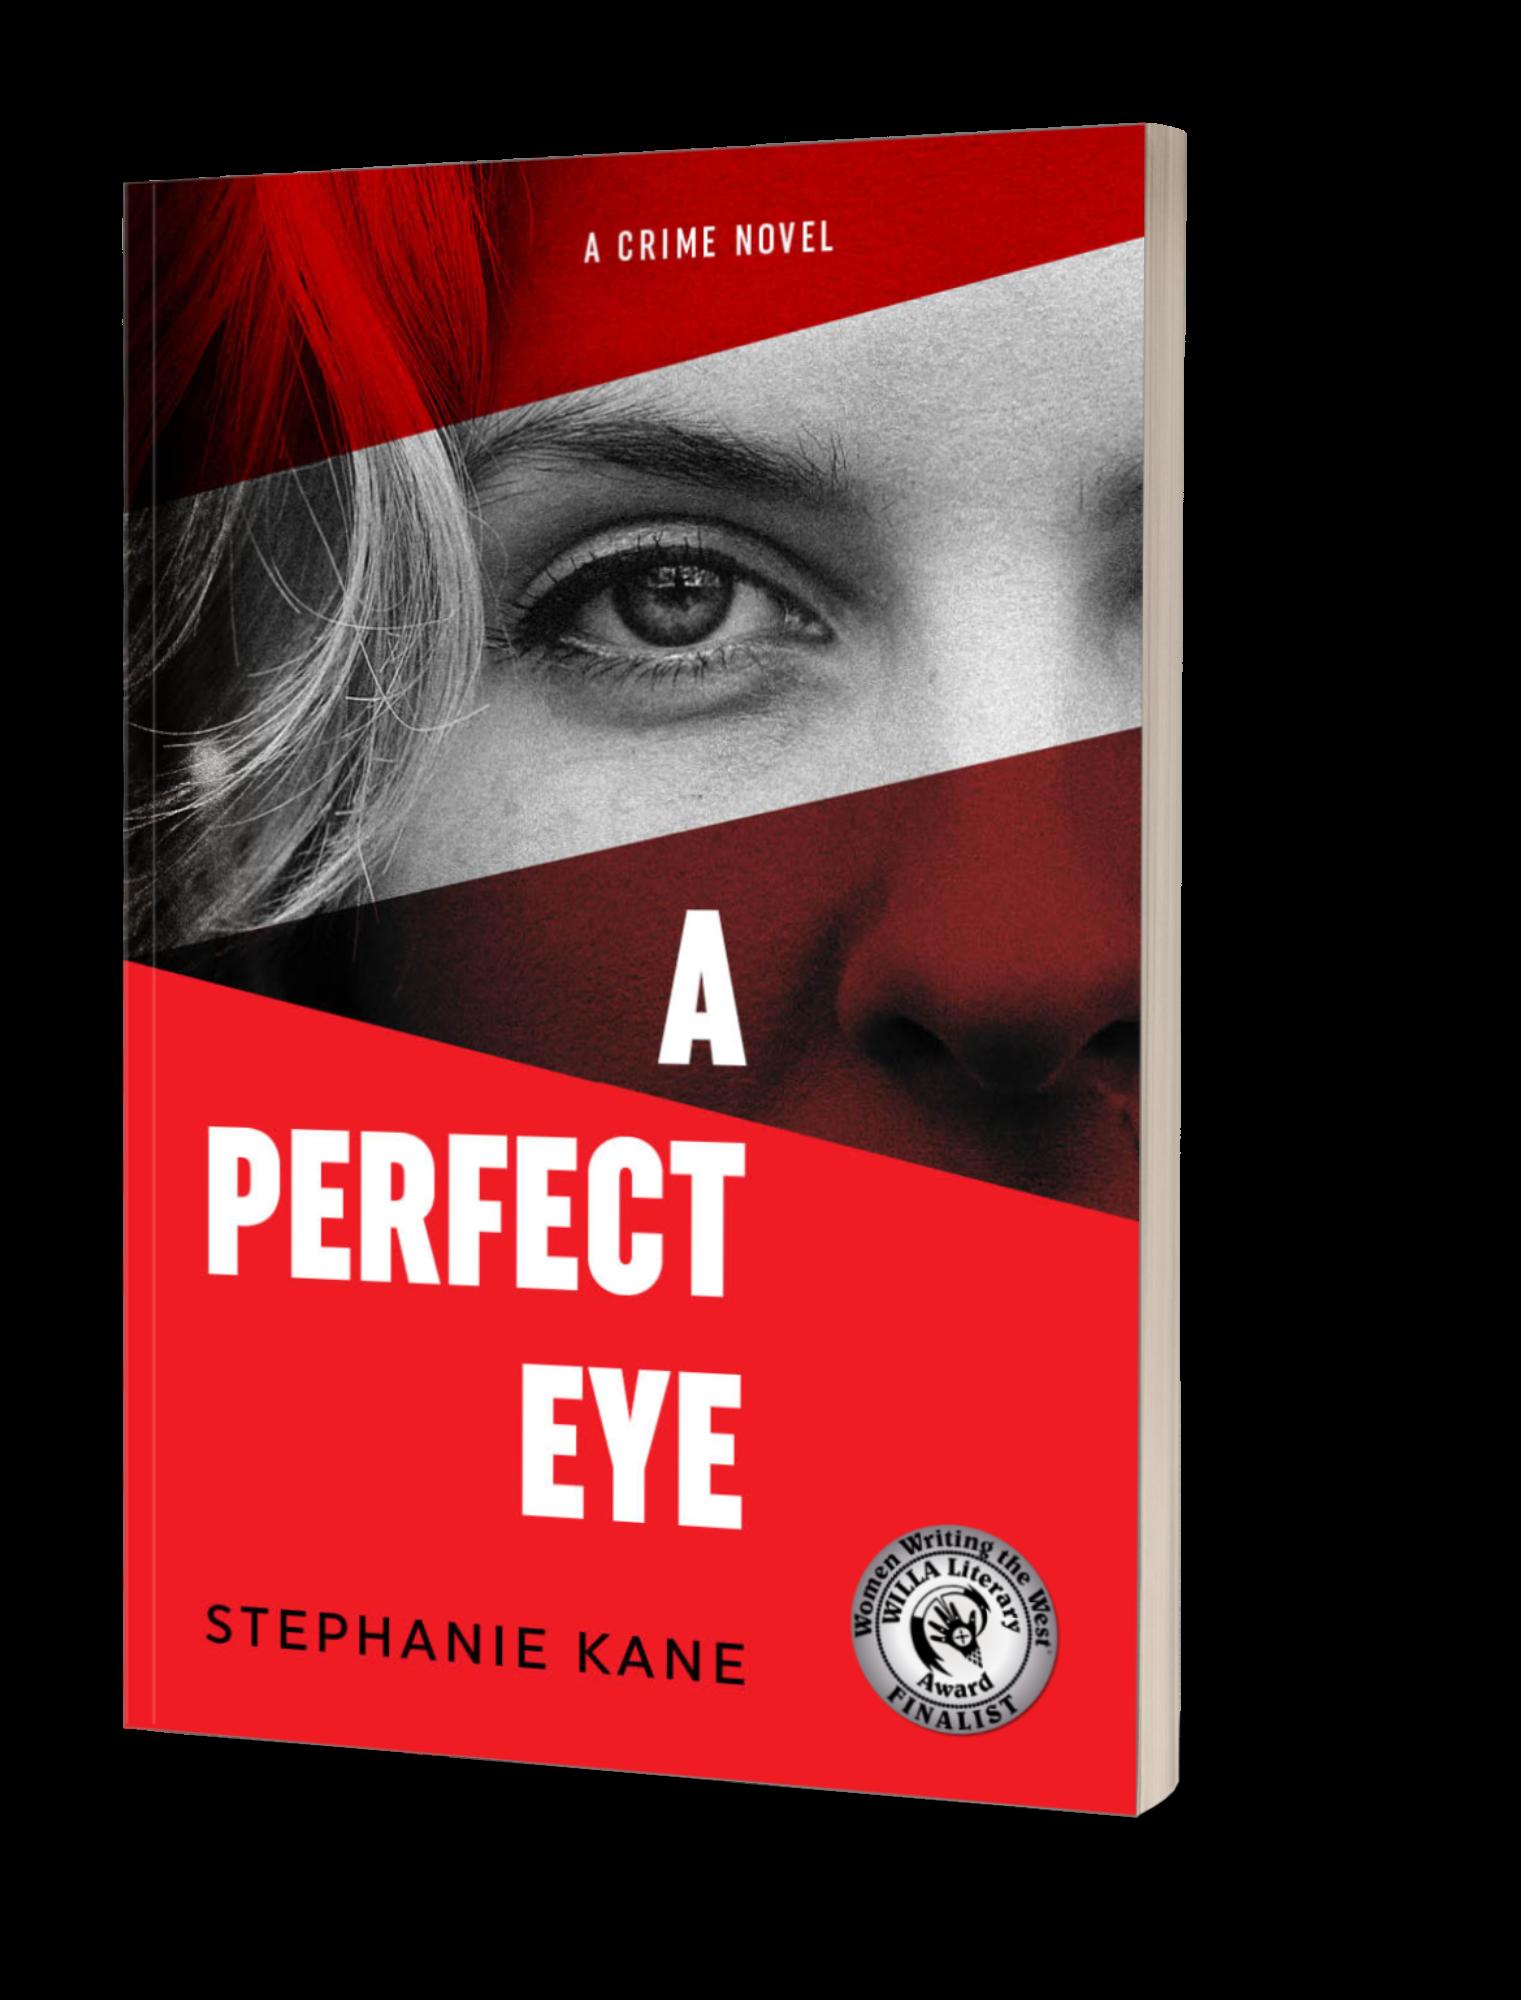 A perfect Eye by Stephanie Kane